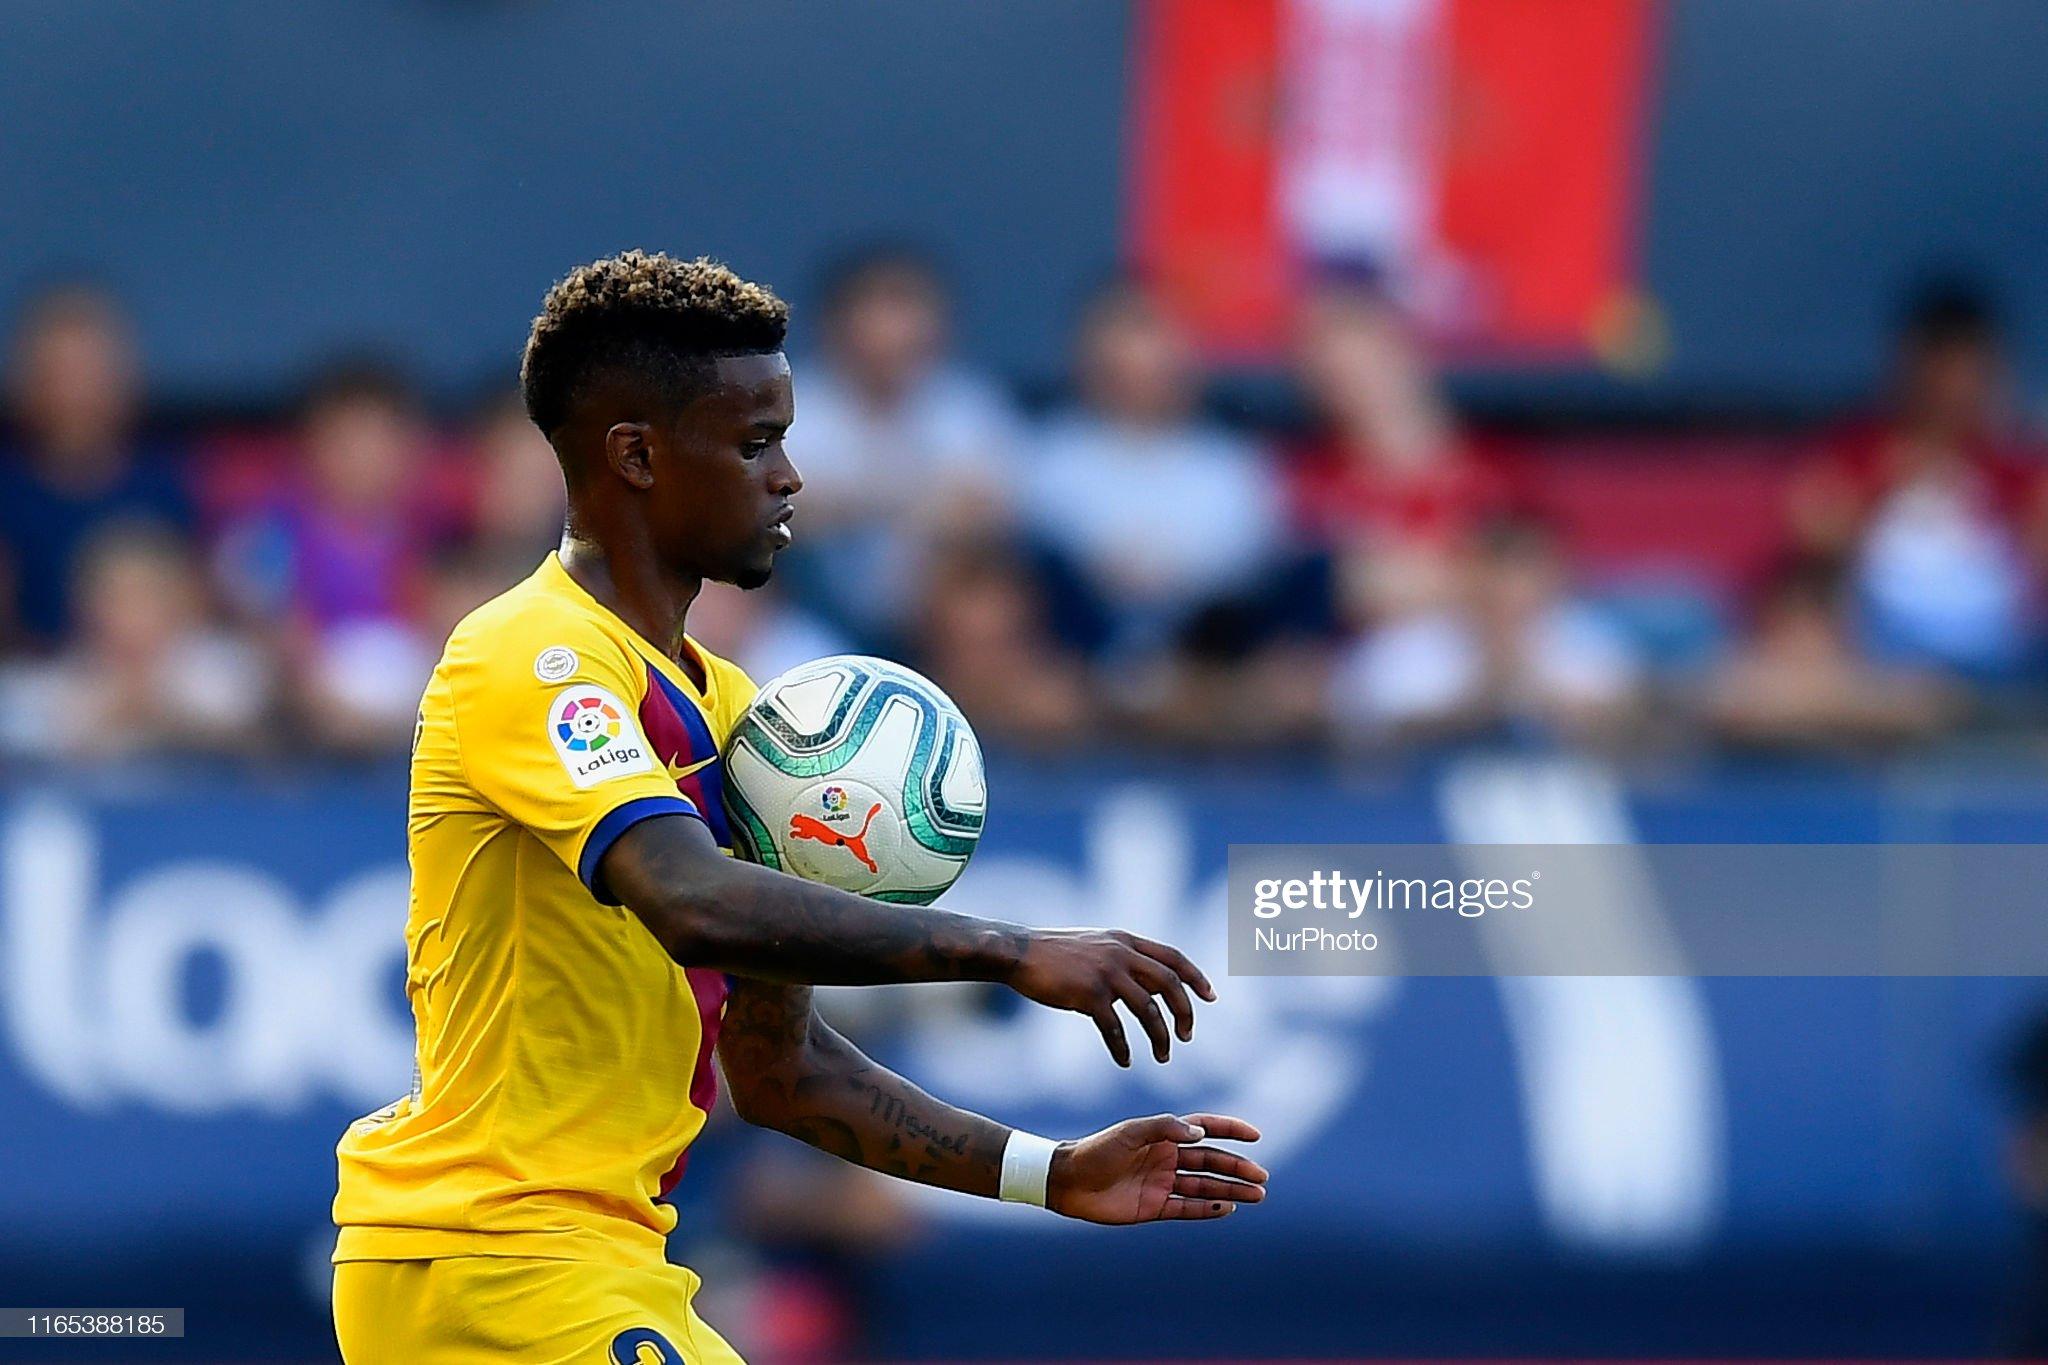 صور مباراة : أوساسونا - برشلونة 2-2 ( 31-08-2019 )  Nelson-semedo-of-barcelona-controls-the-ball-during-the-liga-match-picture-id1165388185?s=2048x2048